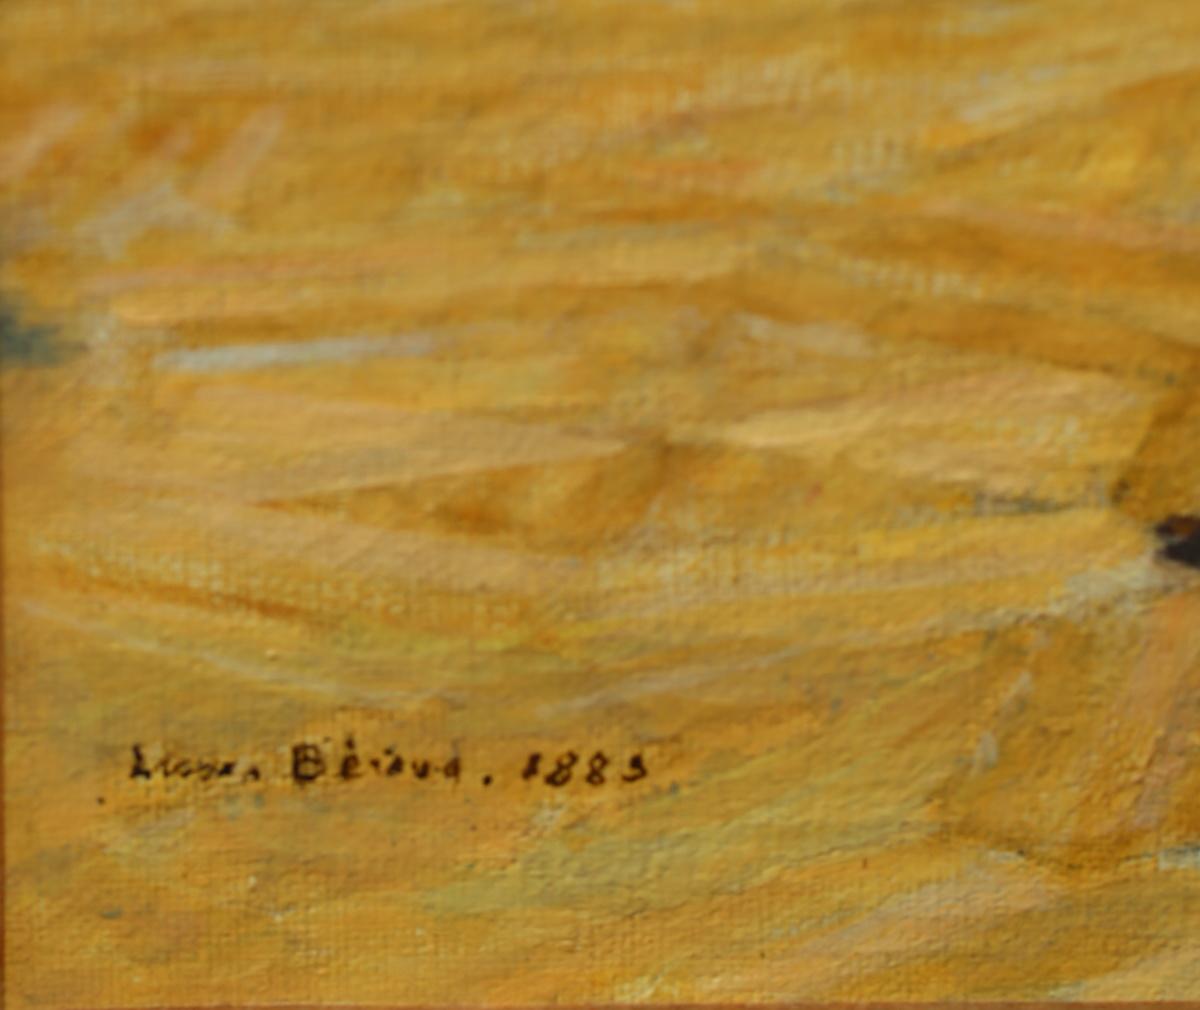 Louis BEROUD 1852-1930